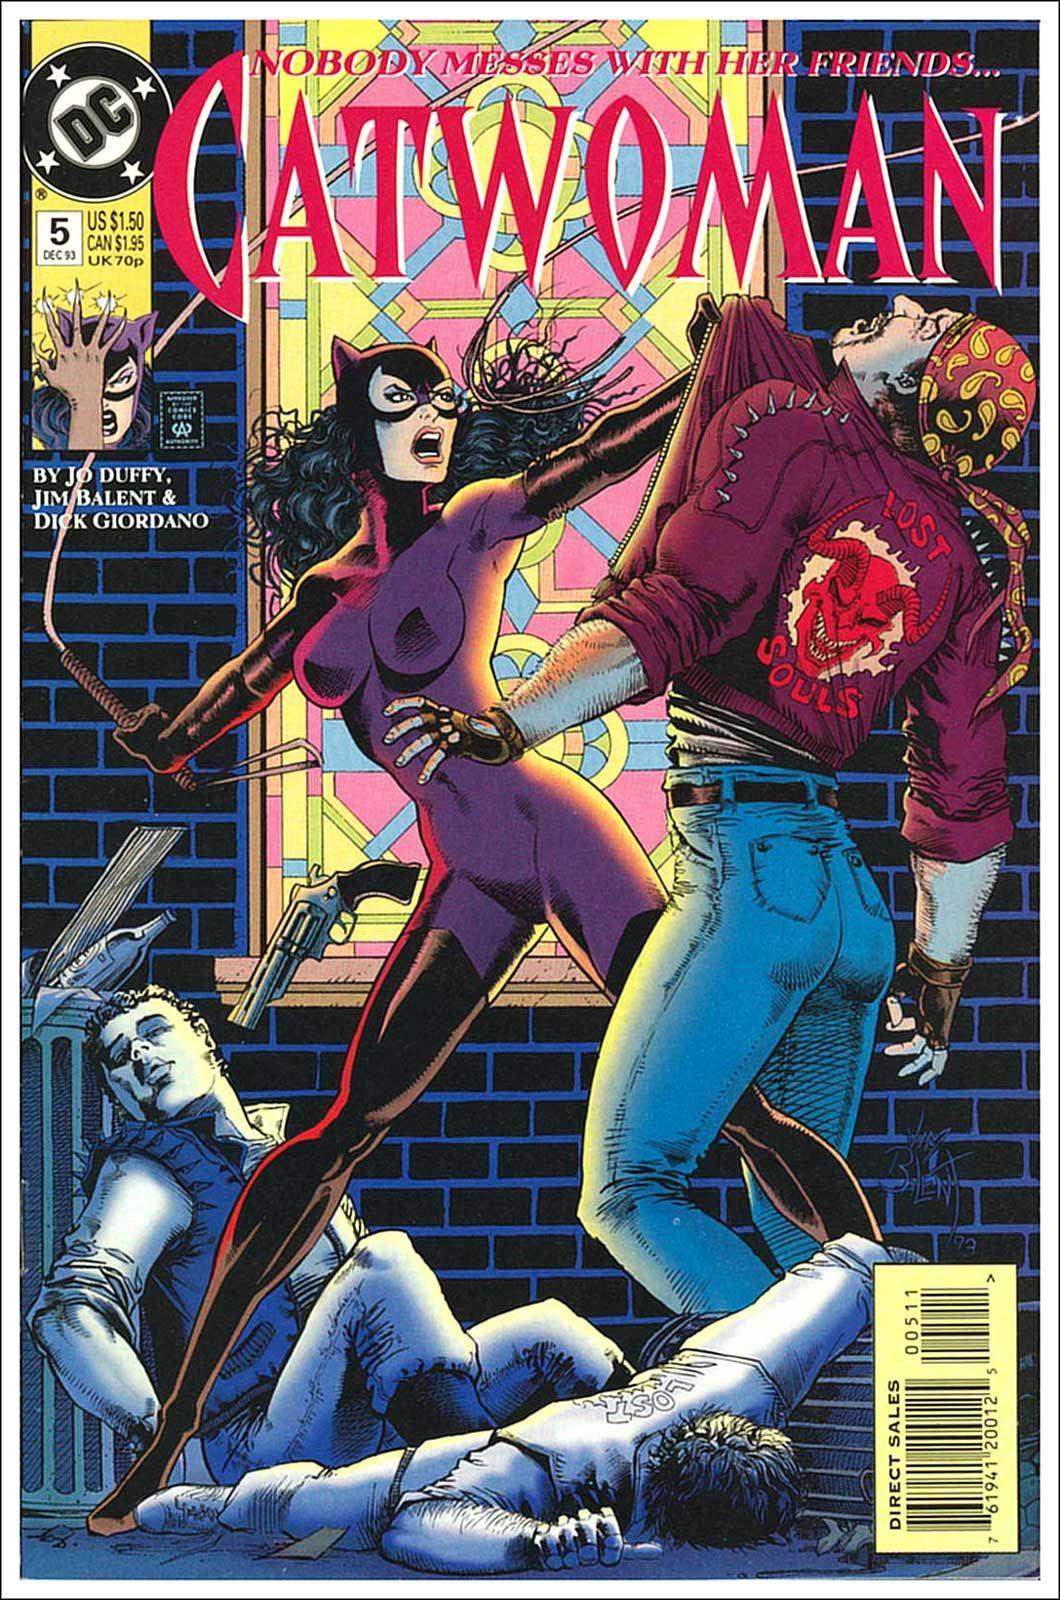 Comic Book Cover Art : Viewliner ltd comic book cover art catwoman